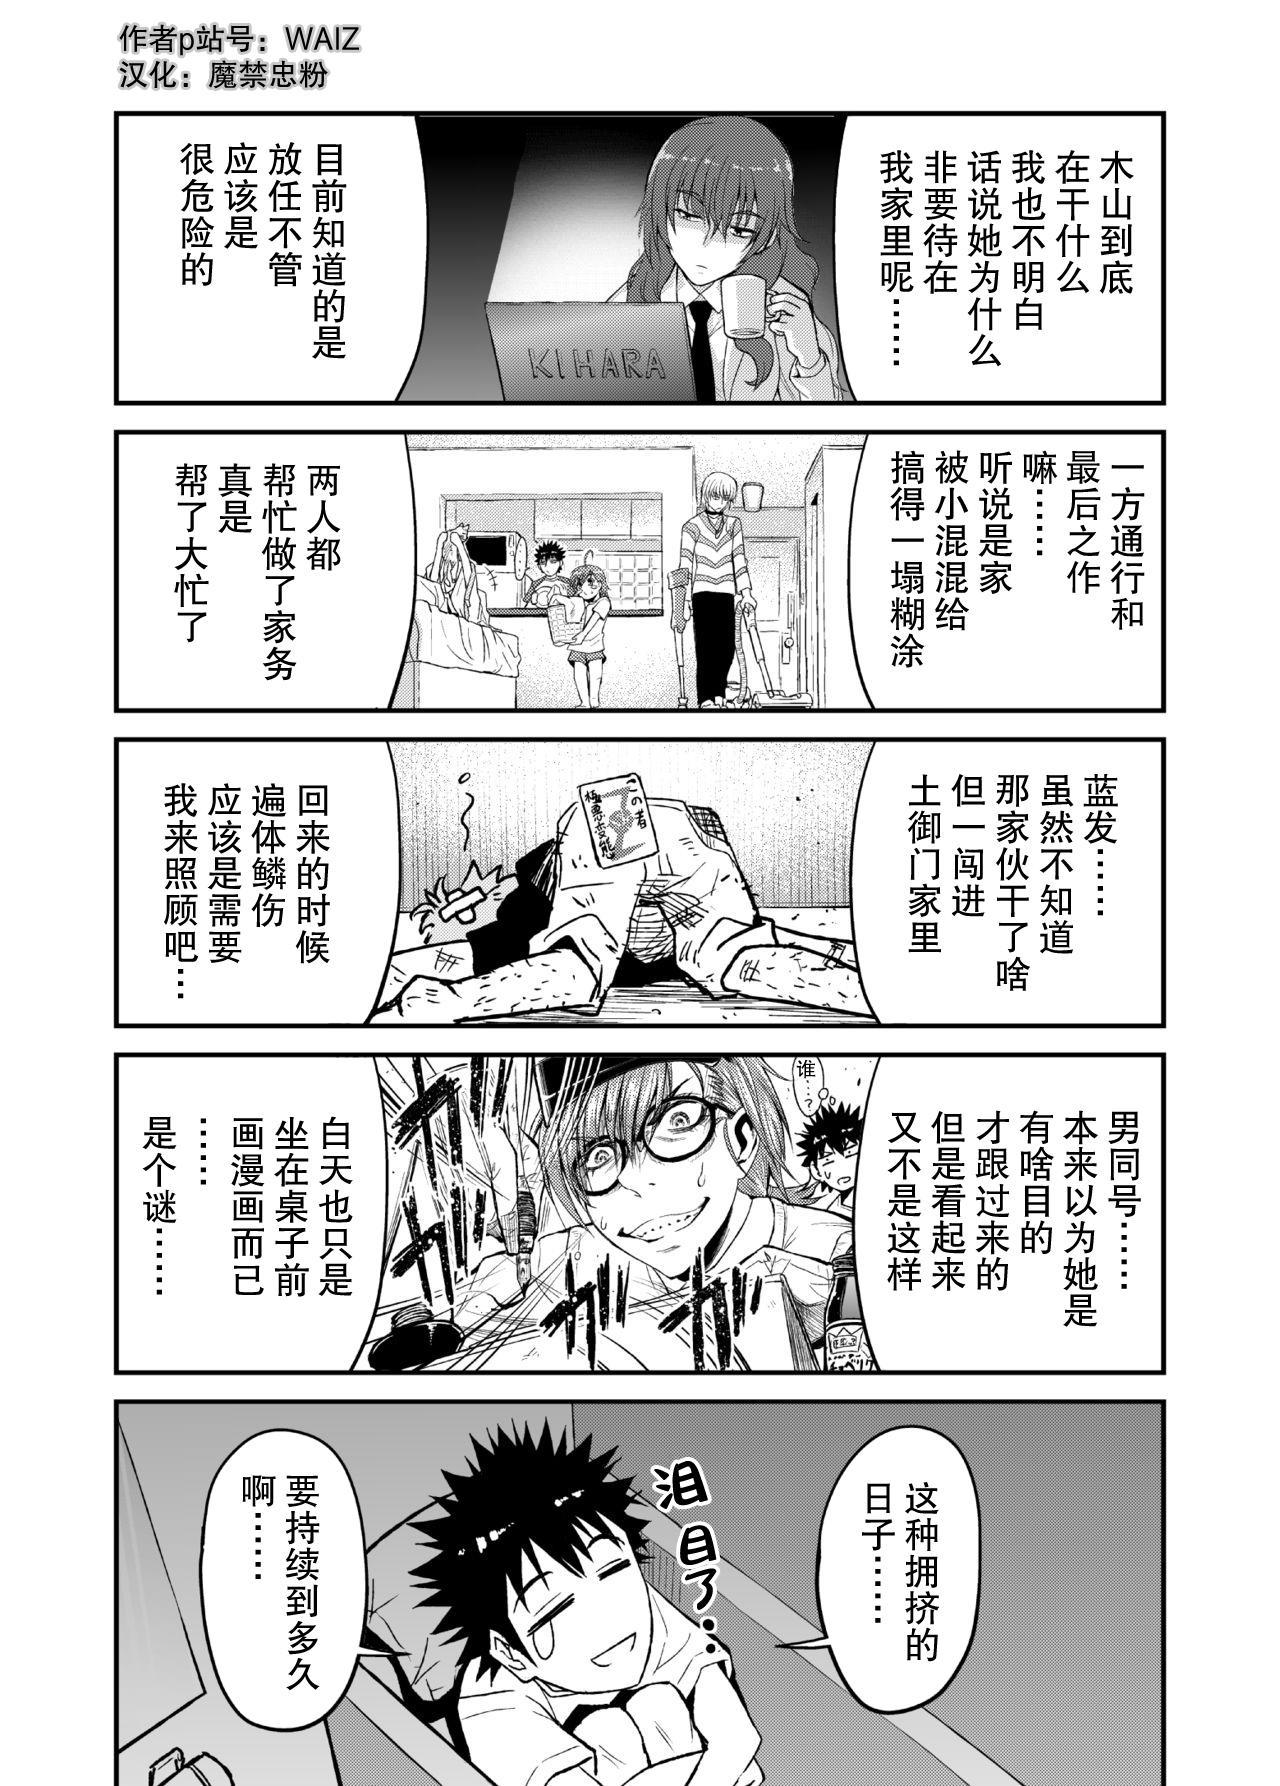 [WAIZ][同人个人渣汉化][就算是上条先生我家要住7个人还是太勉强了](Toaru Majutsu no Index) [中国翻译] 38